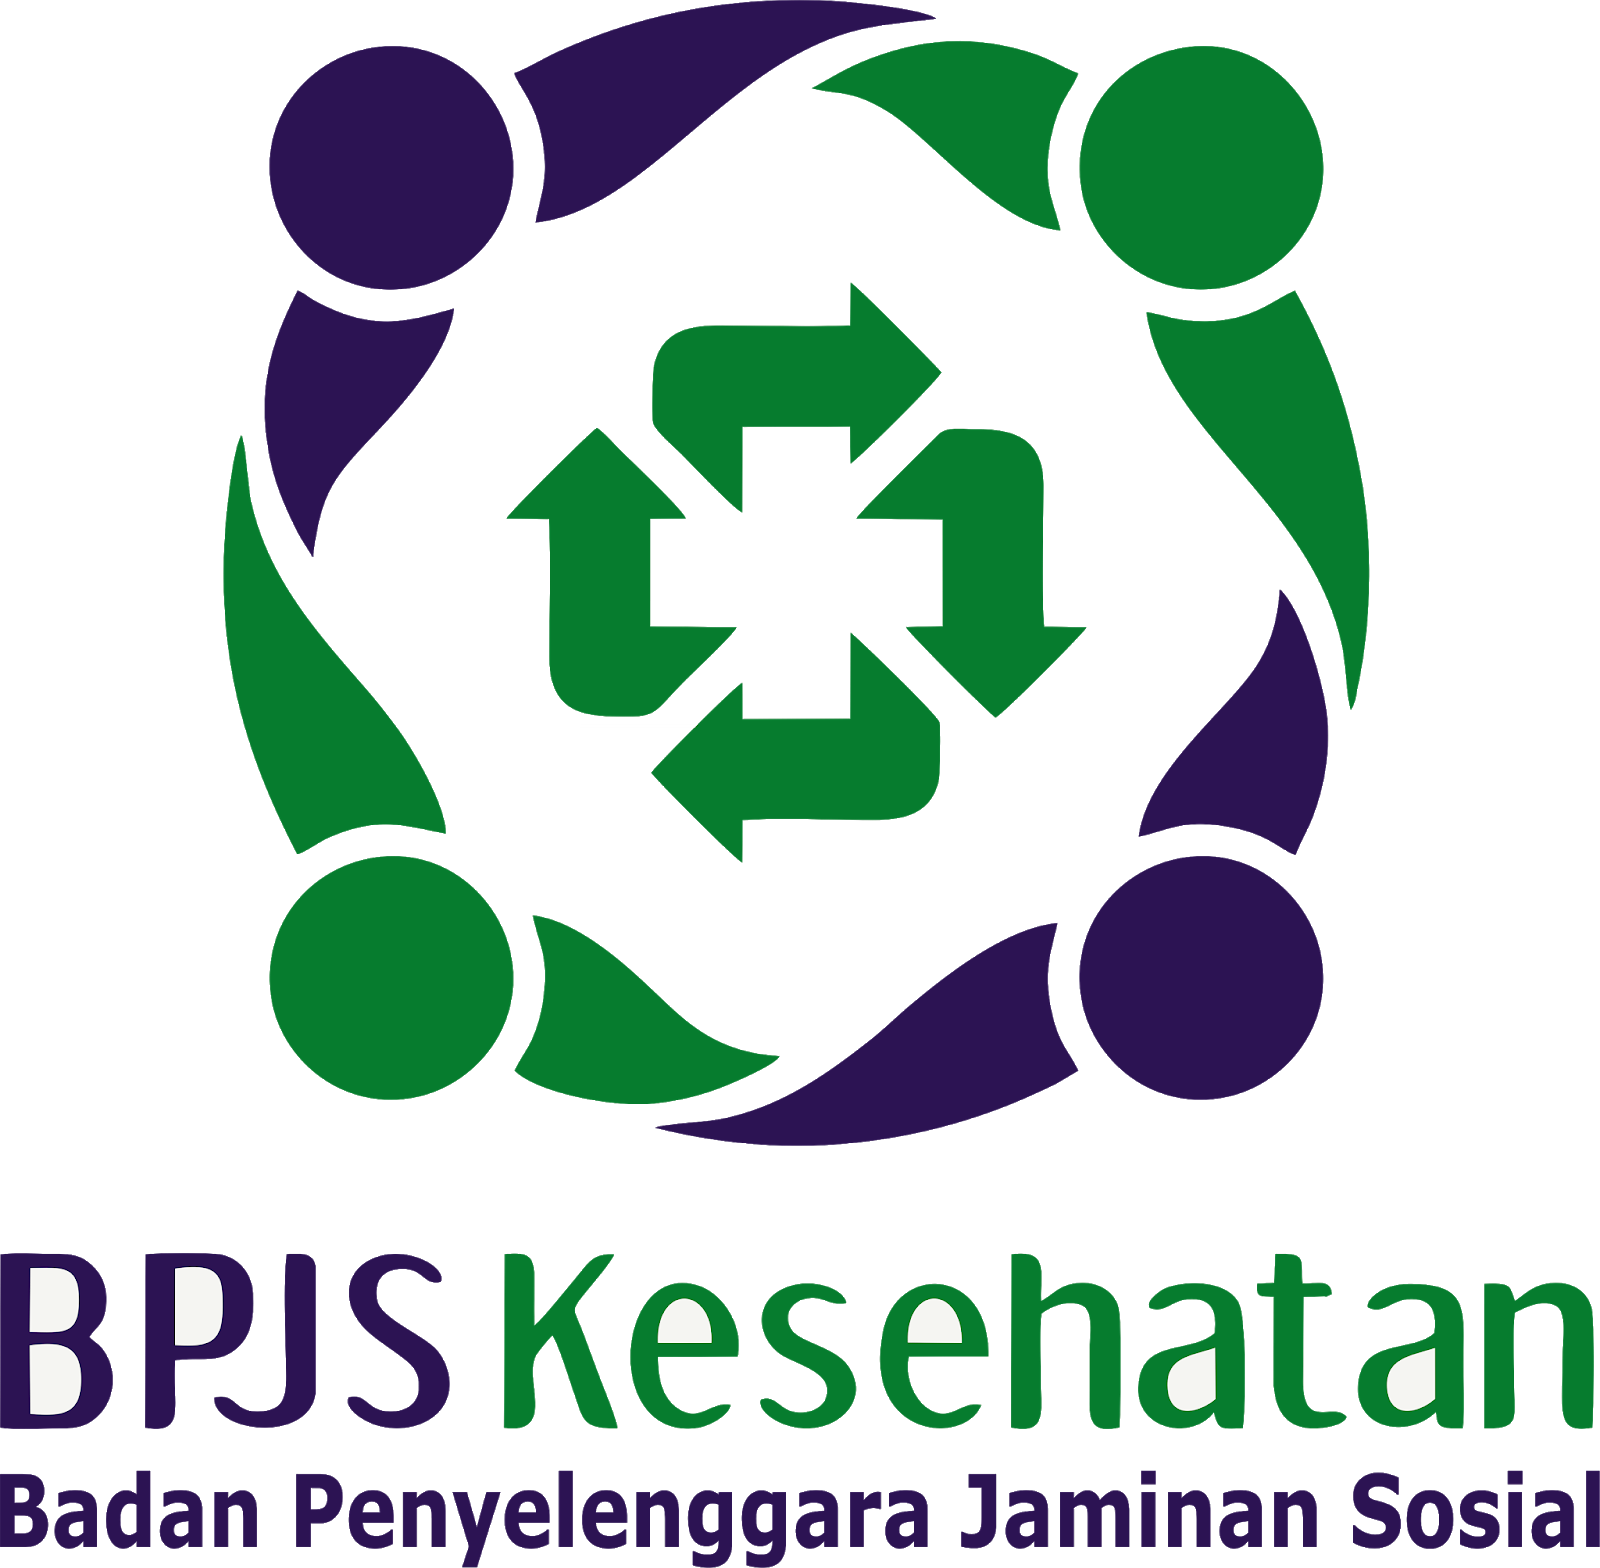 Download Logo Bpjs Kesehatan Format Cdr Media Vector